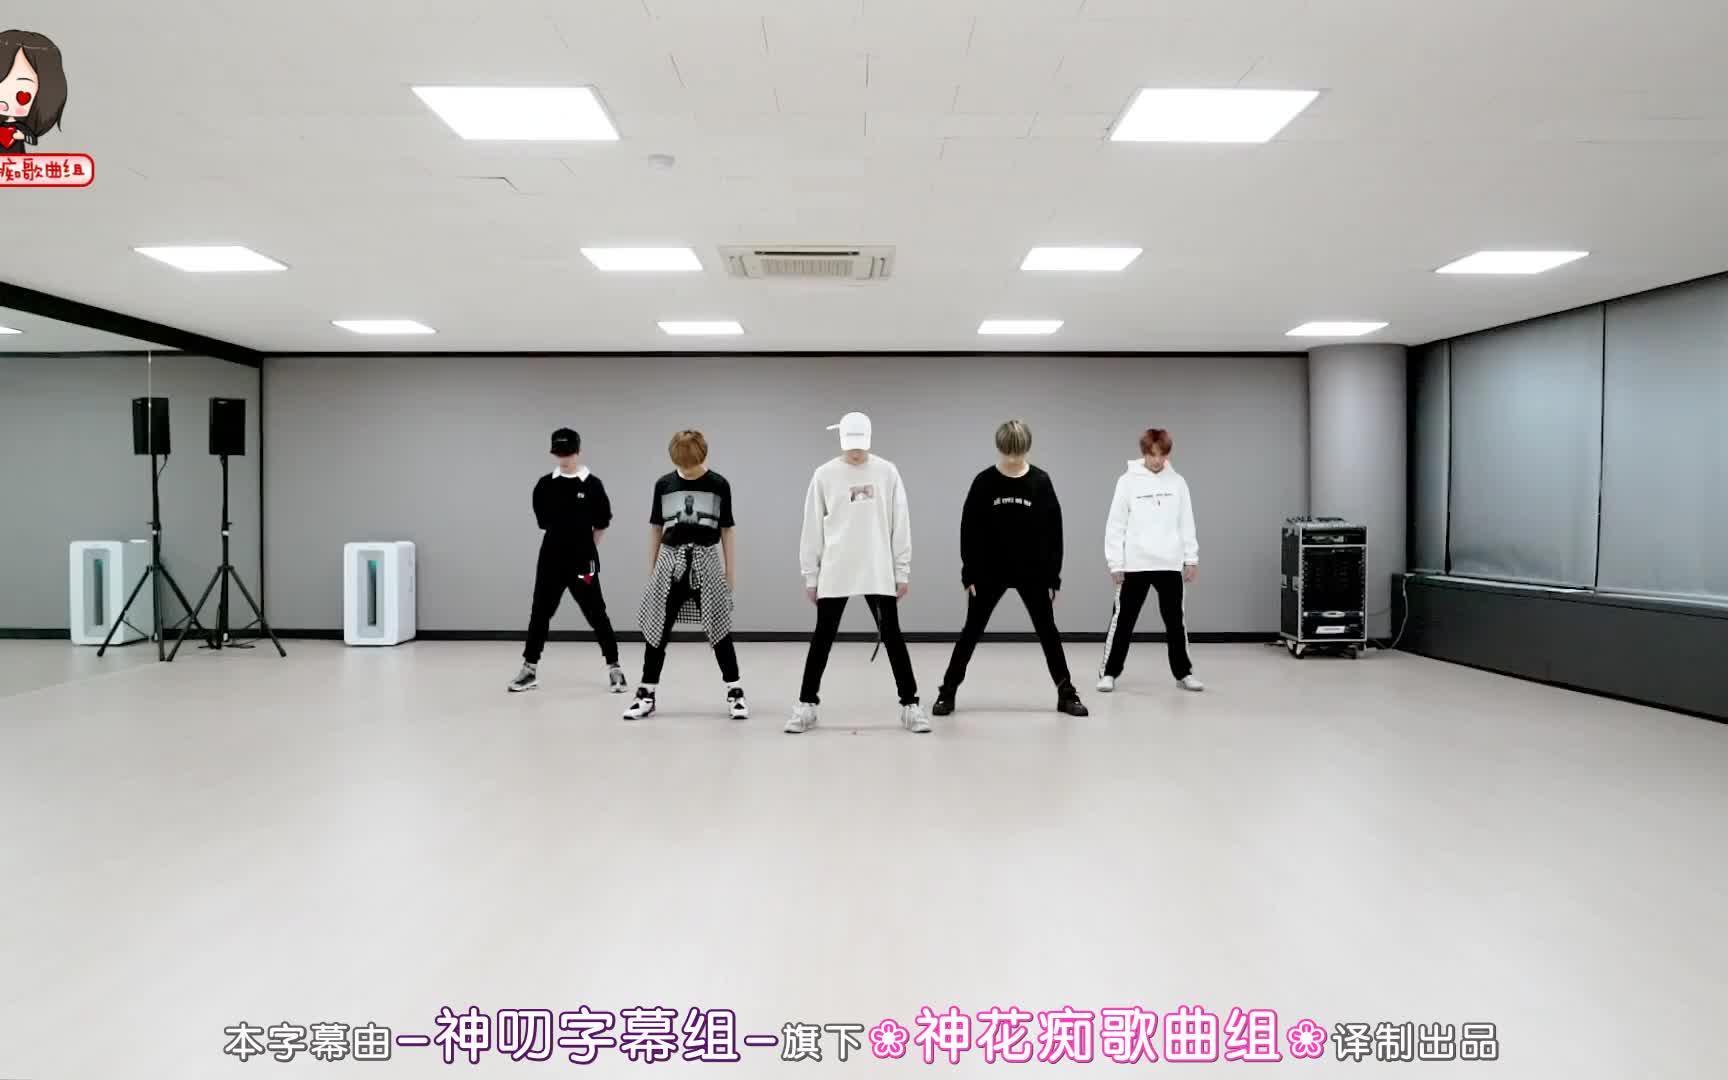 【神叨字幕组】Black Suit练习室-NCT DREAM[中韩双语]